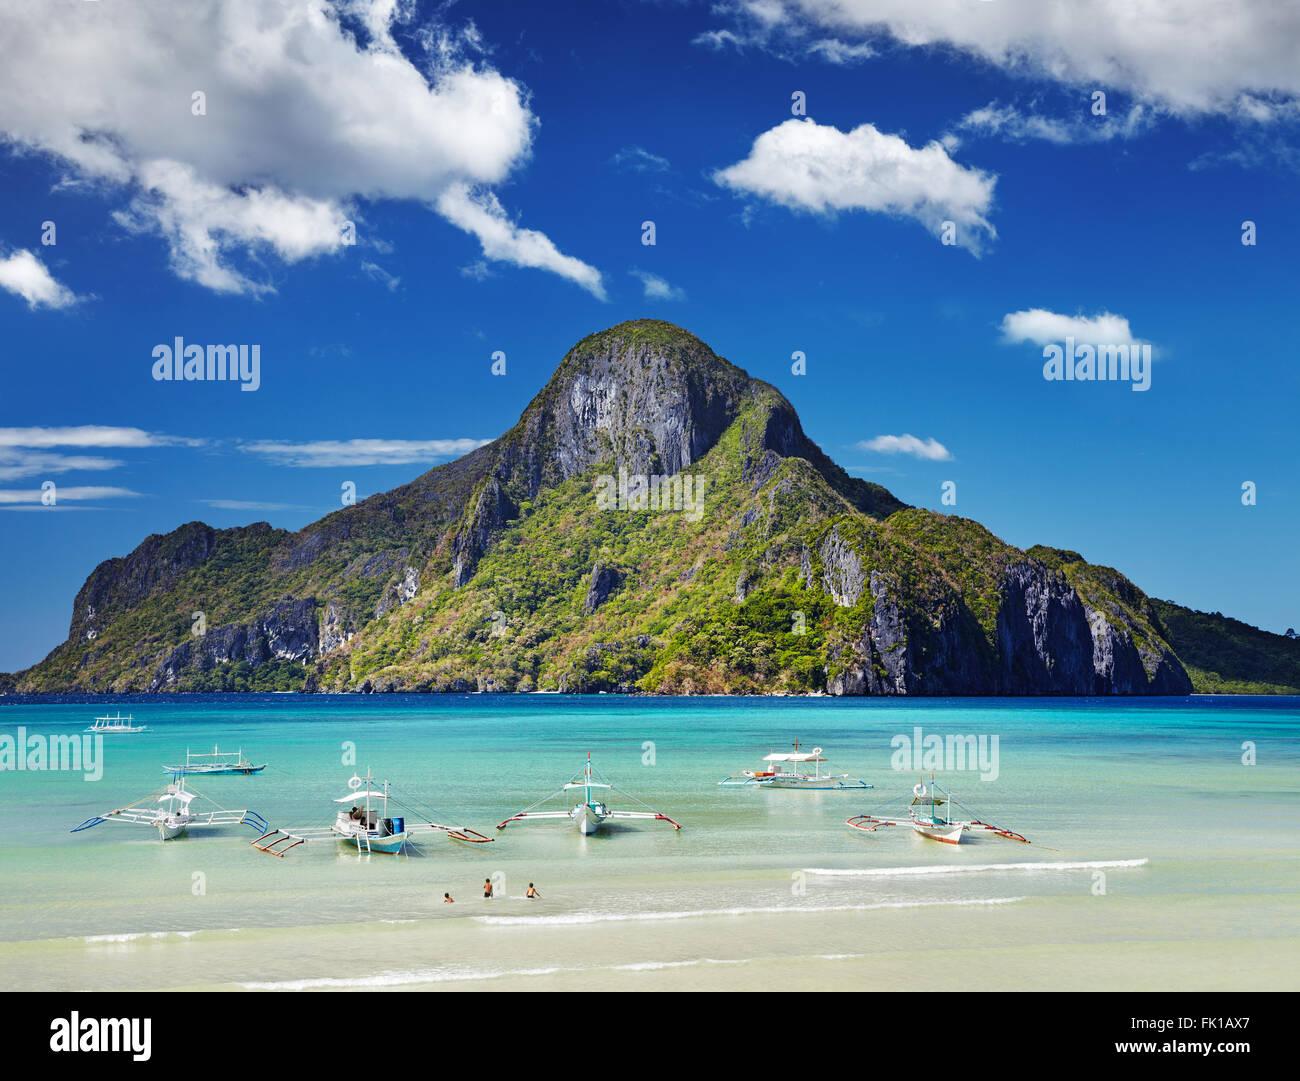 El Nido Bay und Cadlao Island, Palawan, Philippinen Stockbild